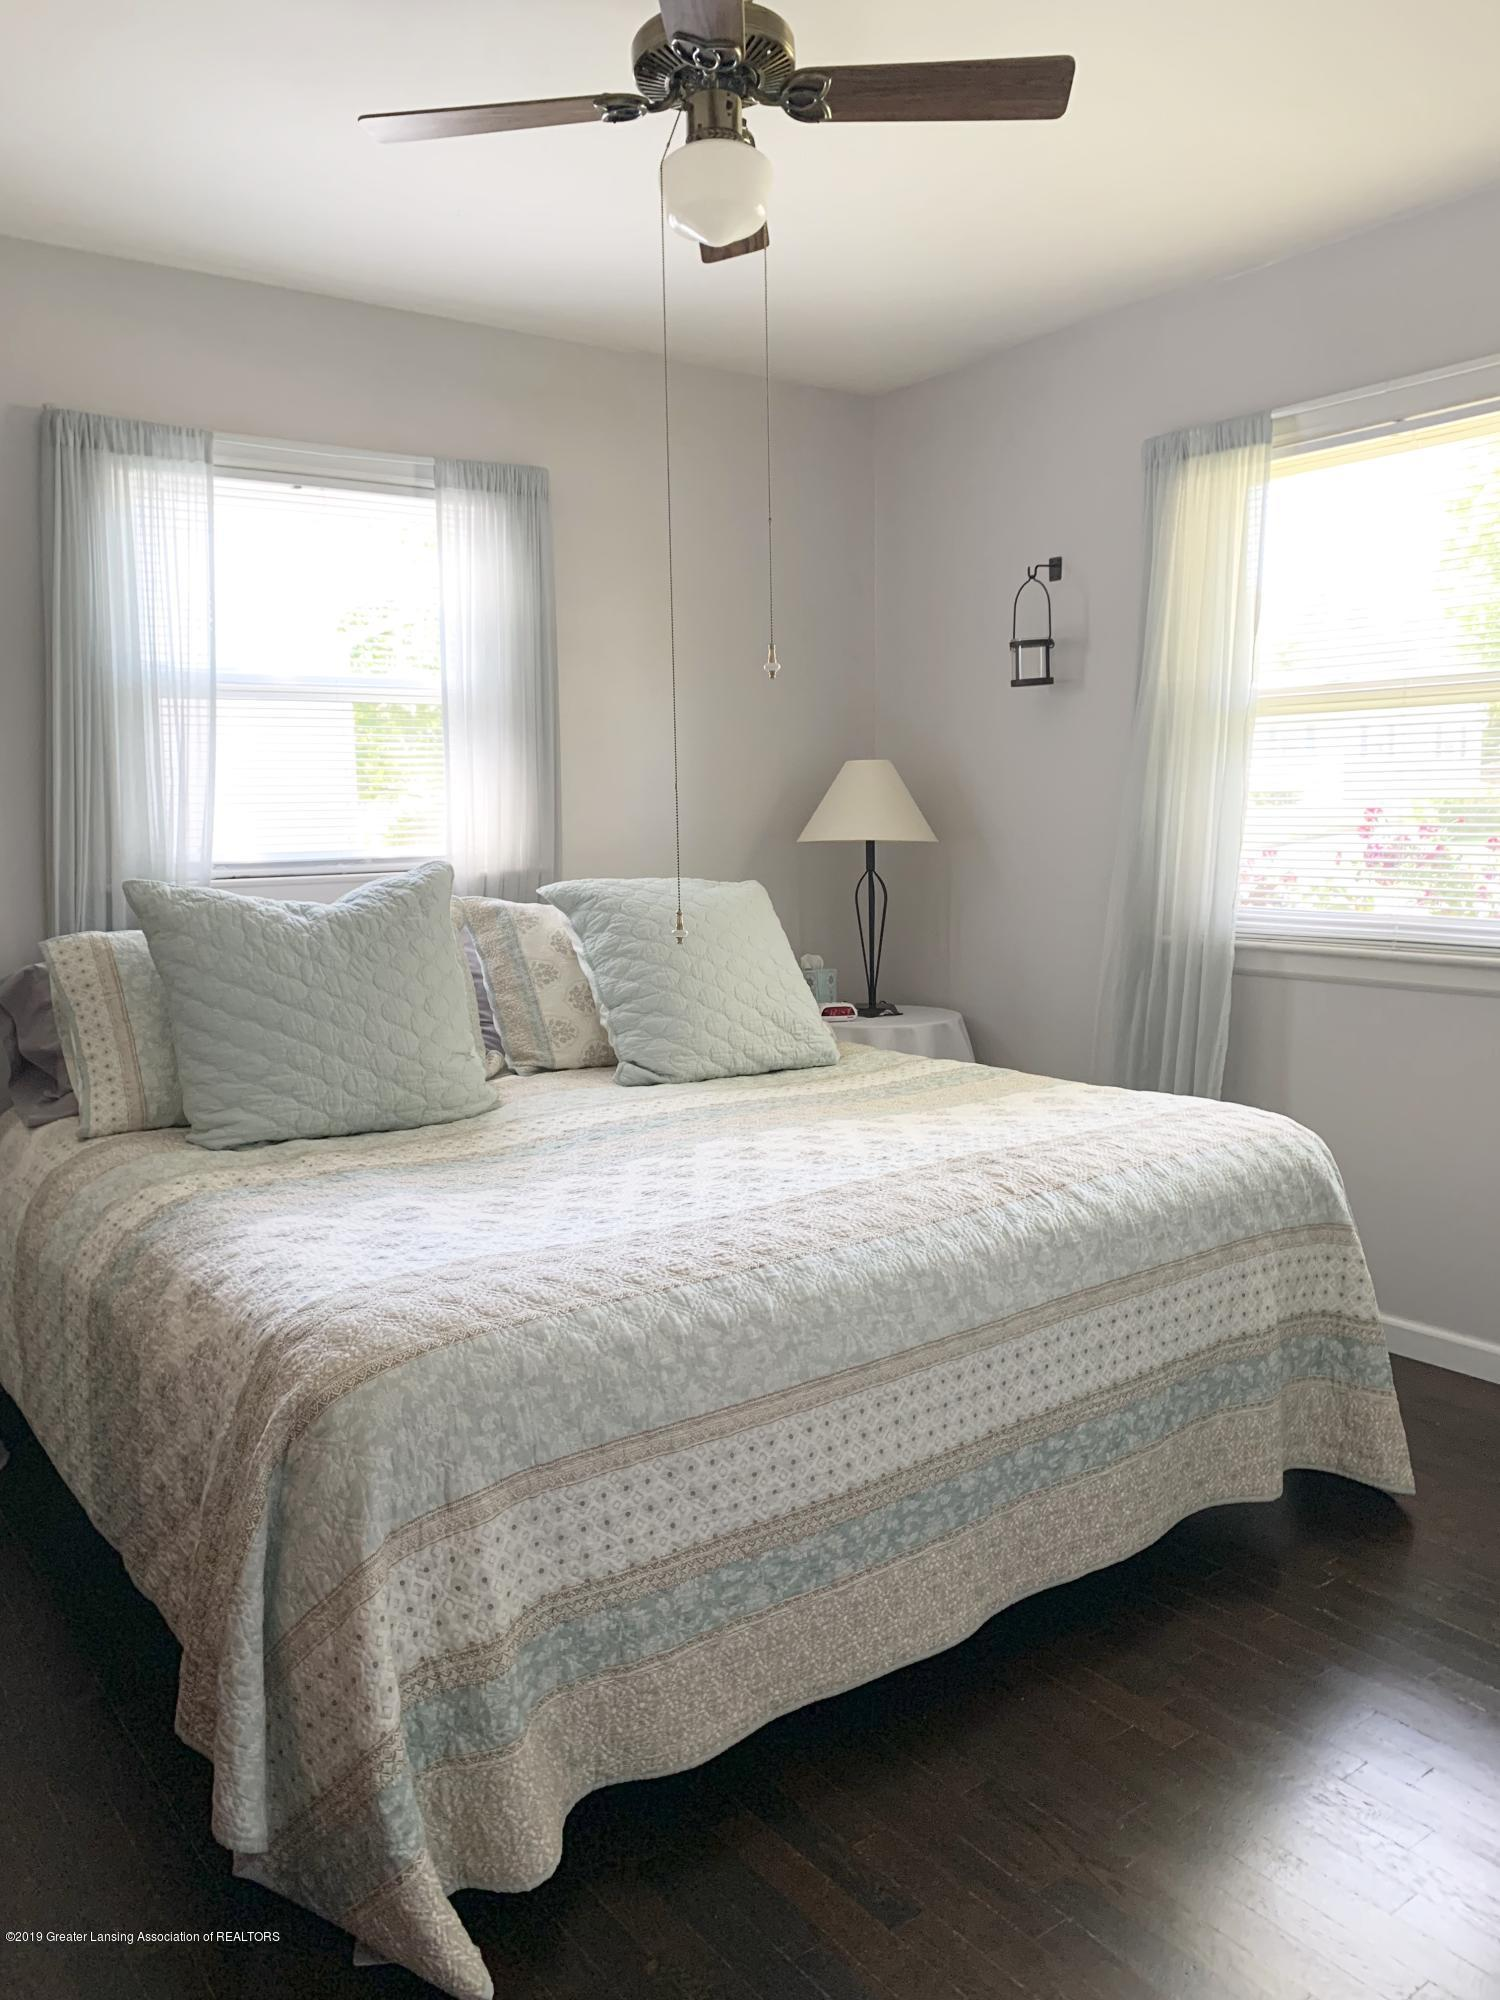 2084 Jefferson St - Master Bedroom - 12